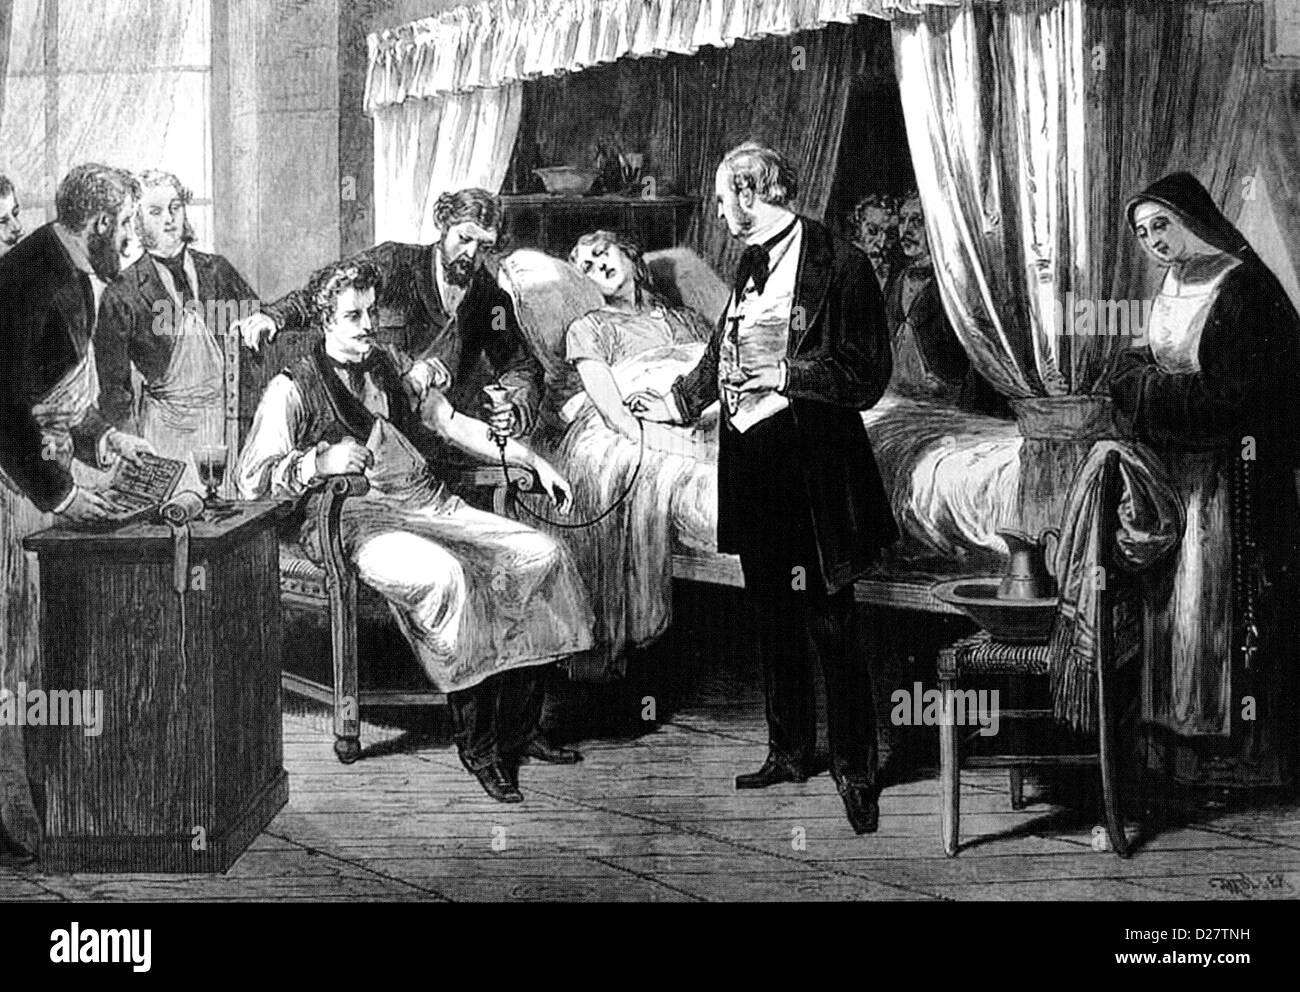 BLOOD TRANSFUSION at the Hopital de la Pitie, Paris, in 1874 - Stock Image